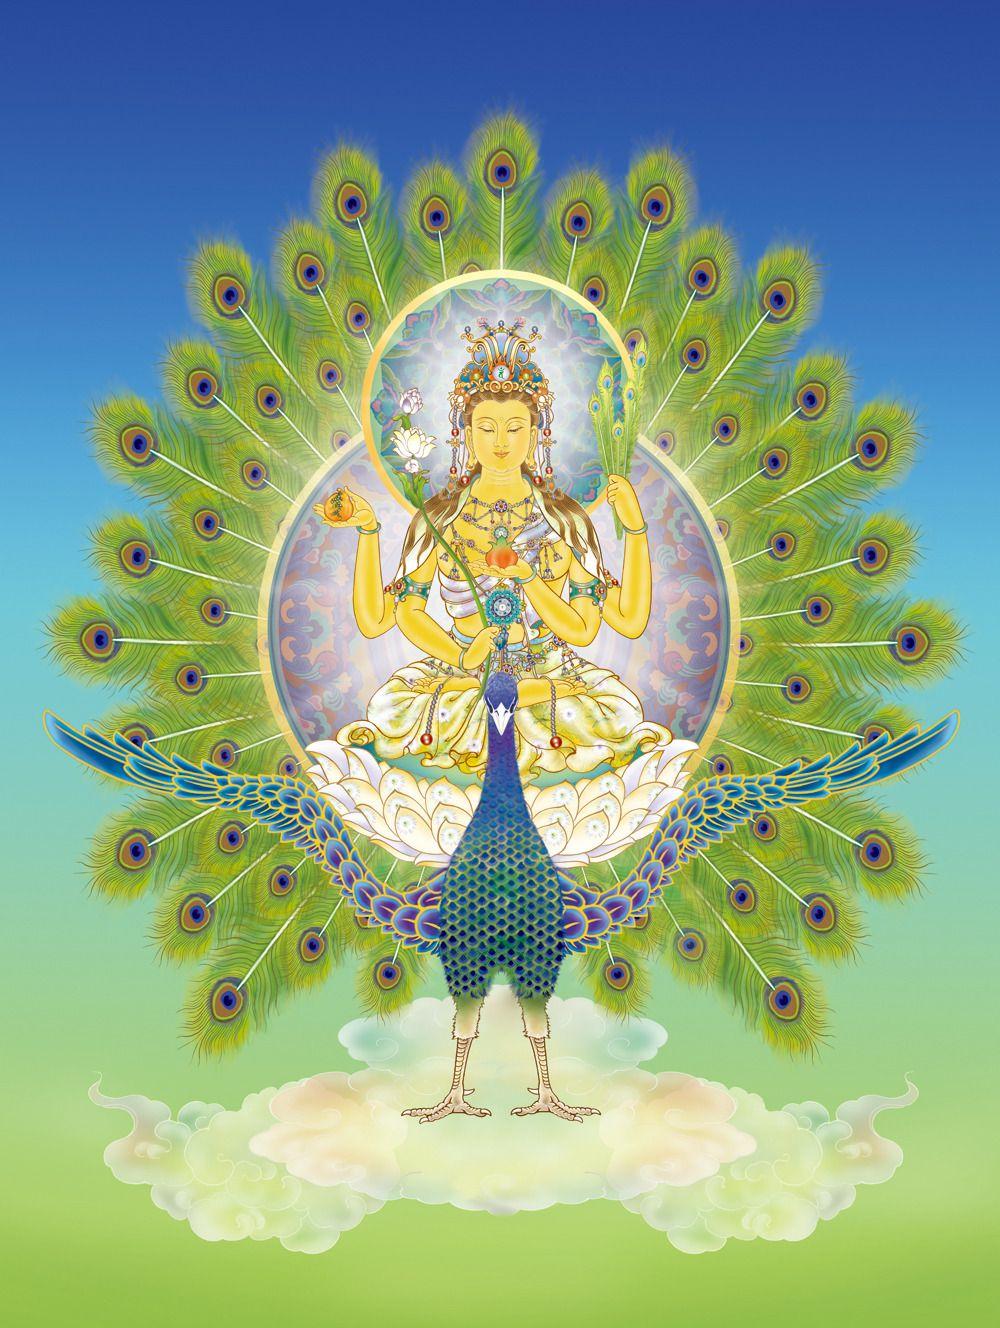 Mahamayuri, also called Mahamayuir Vidya-rajni, is a peaceful goddess of  wisdom (similar to Saraswati in Hinduism)   Buddhist art, Wiccan art, Art